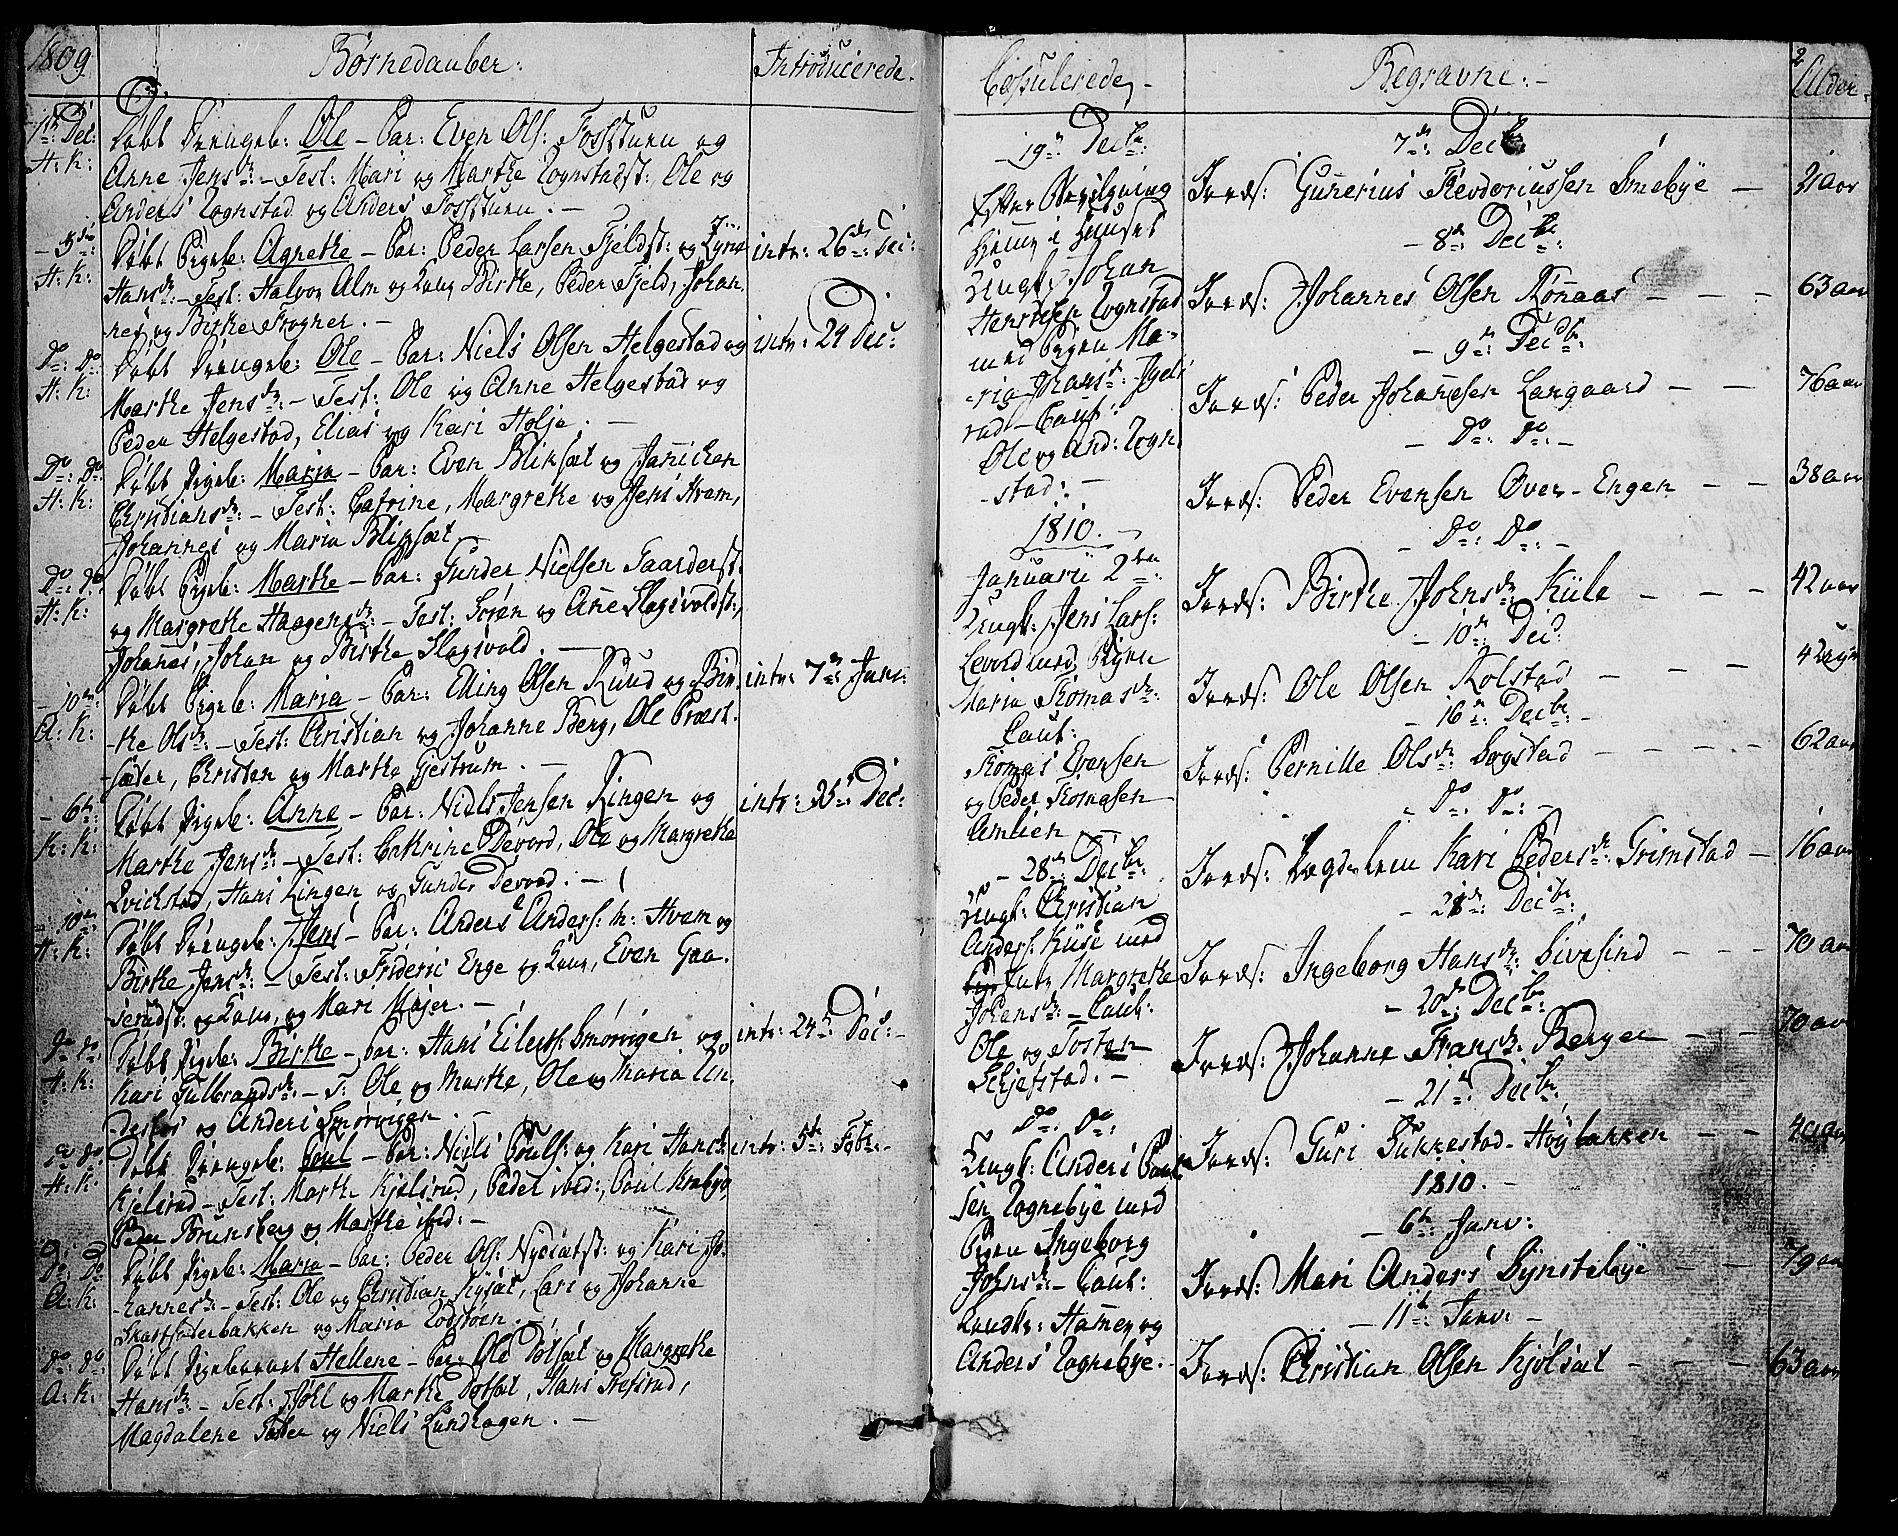 SAH, Toten prestekontor, Ministerialbok nr. 8, 1809-1814, s. 2